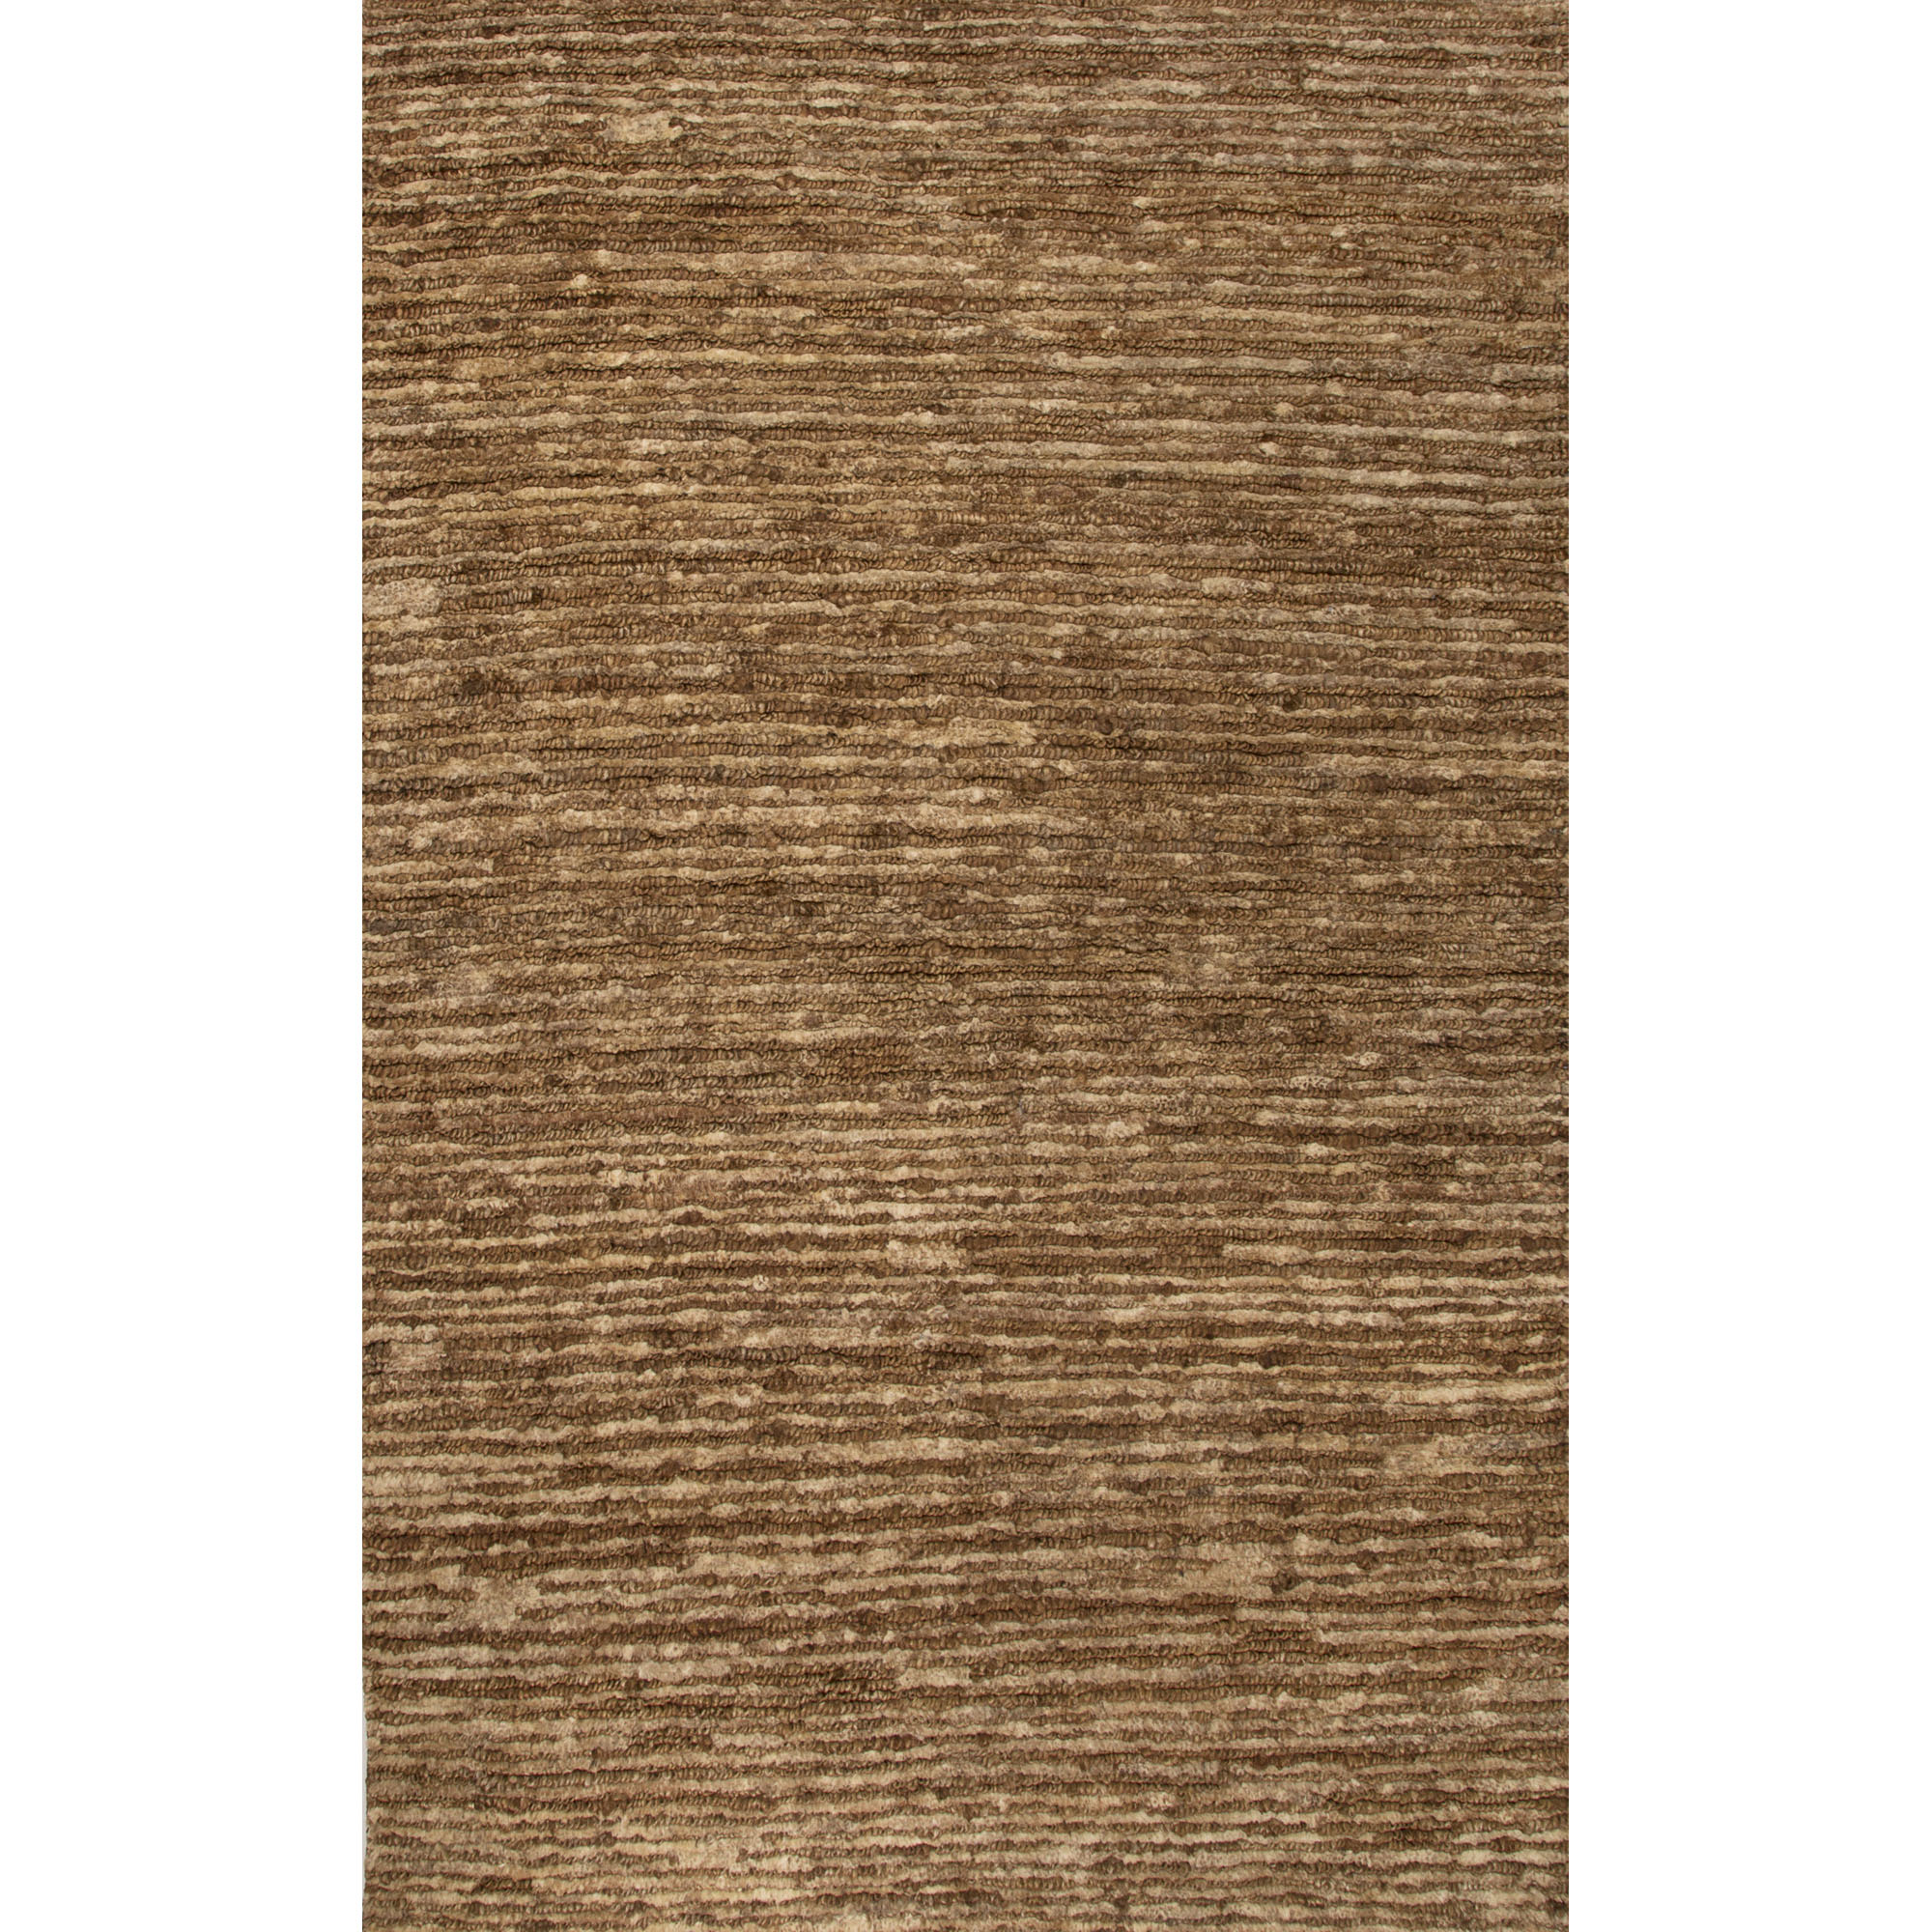 Natural Santo 5 x 8 Rug by JAIPUR Living at Sprintz Furniture